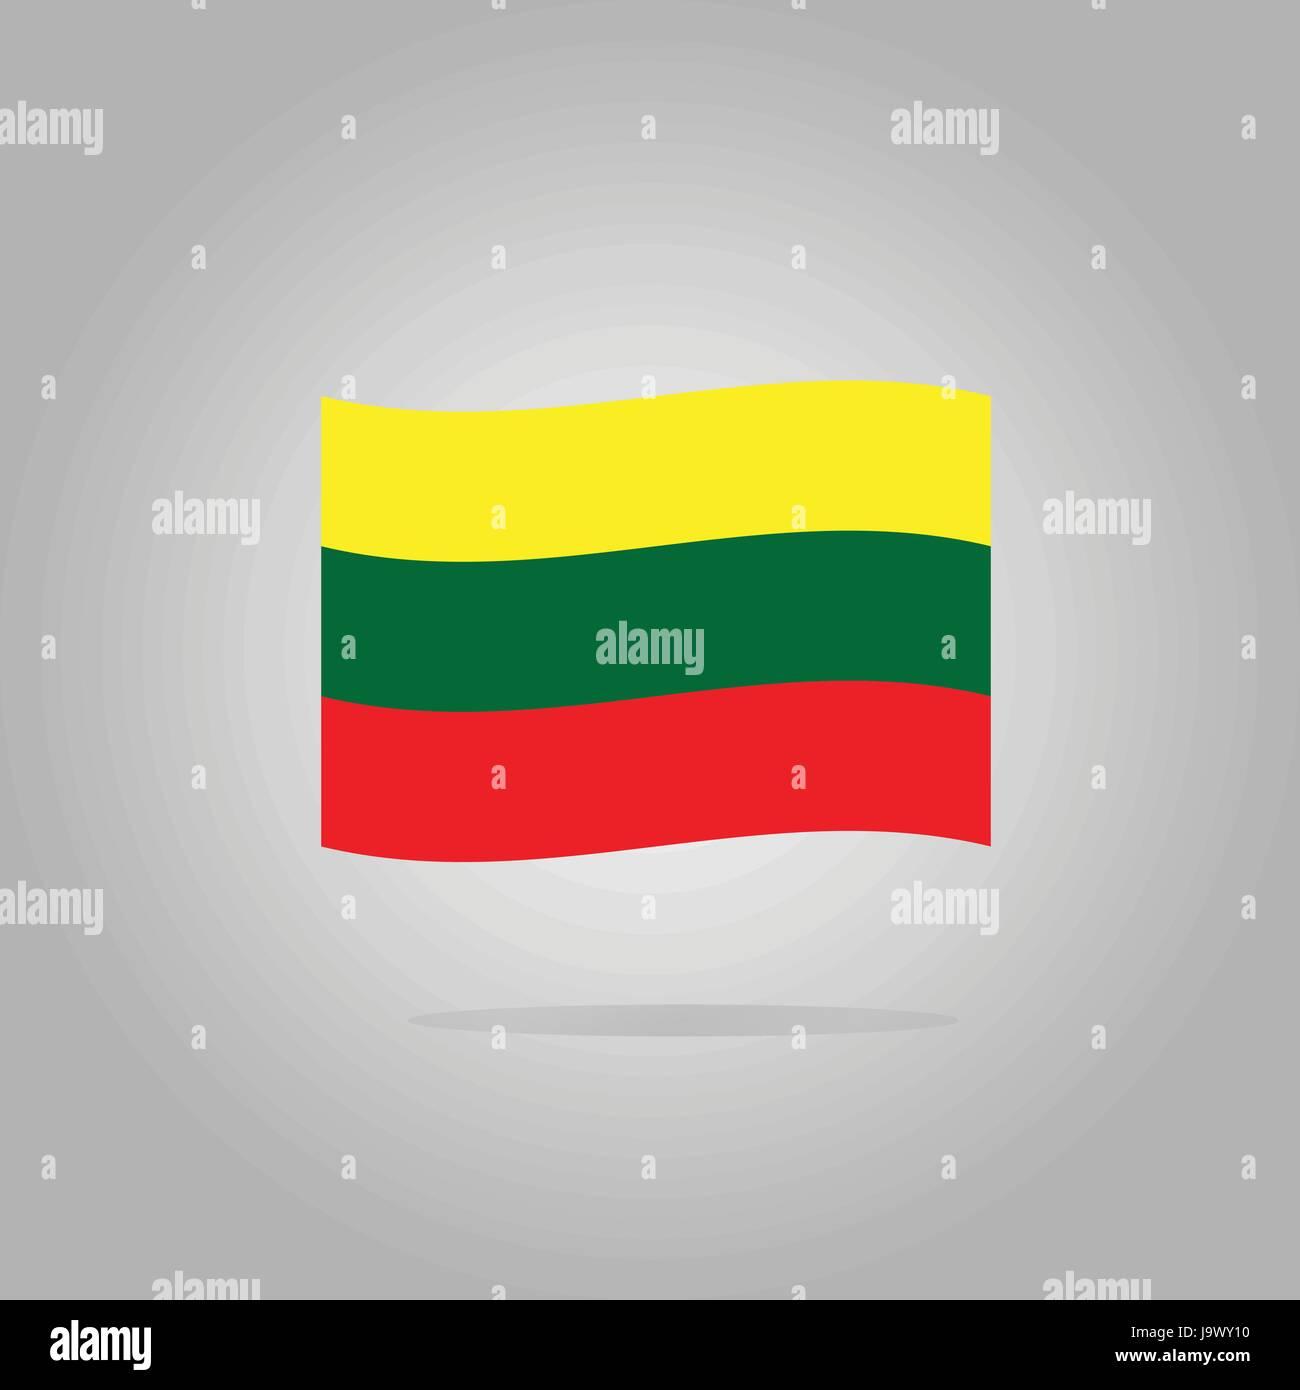 Lithuania flag design illustration - Stock Vector